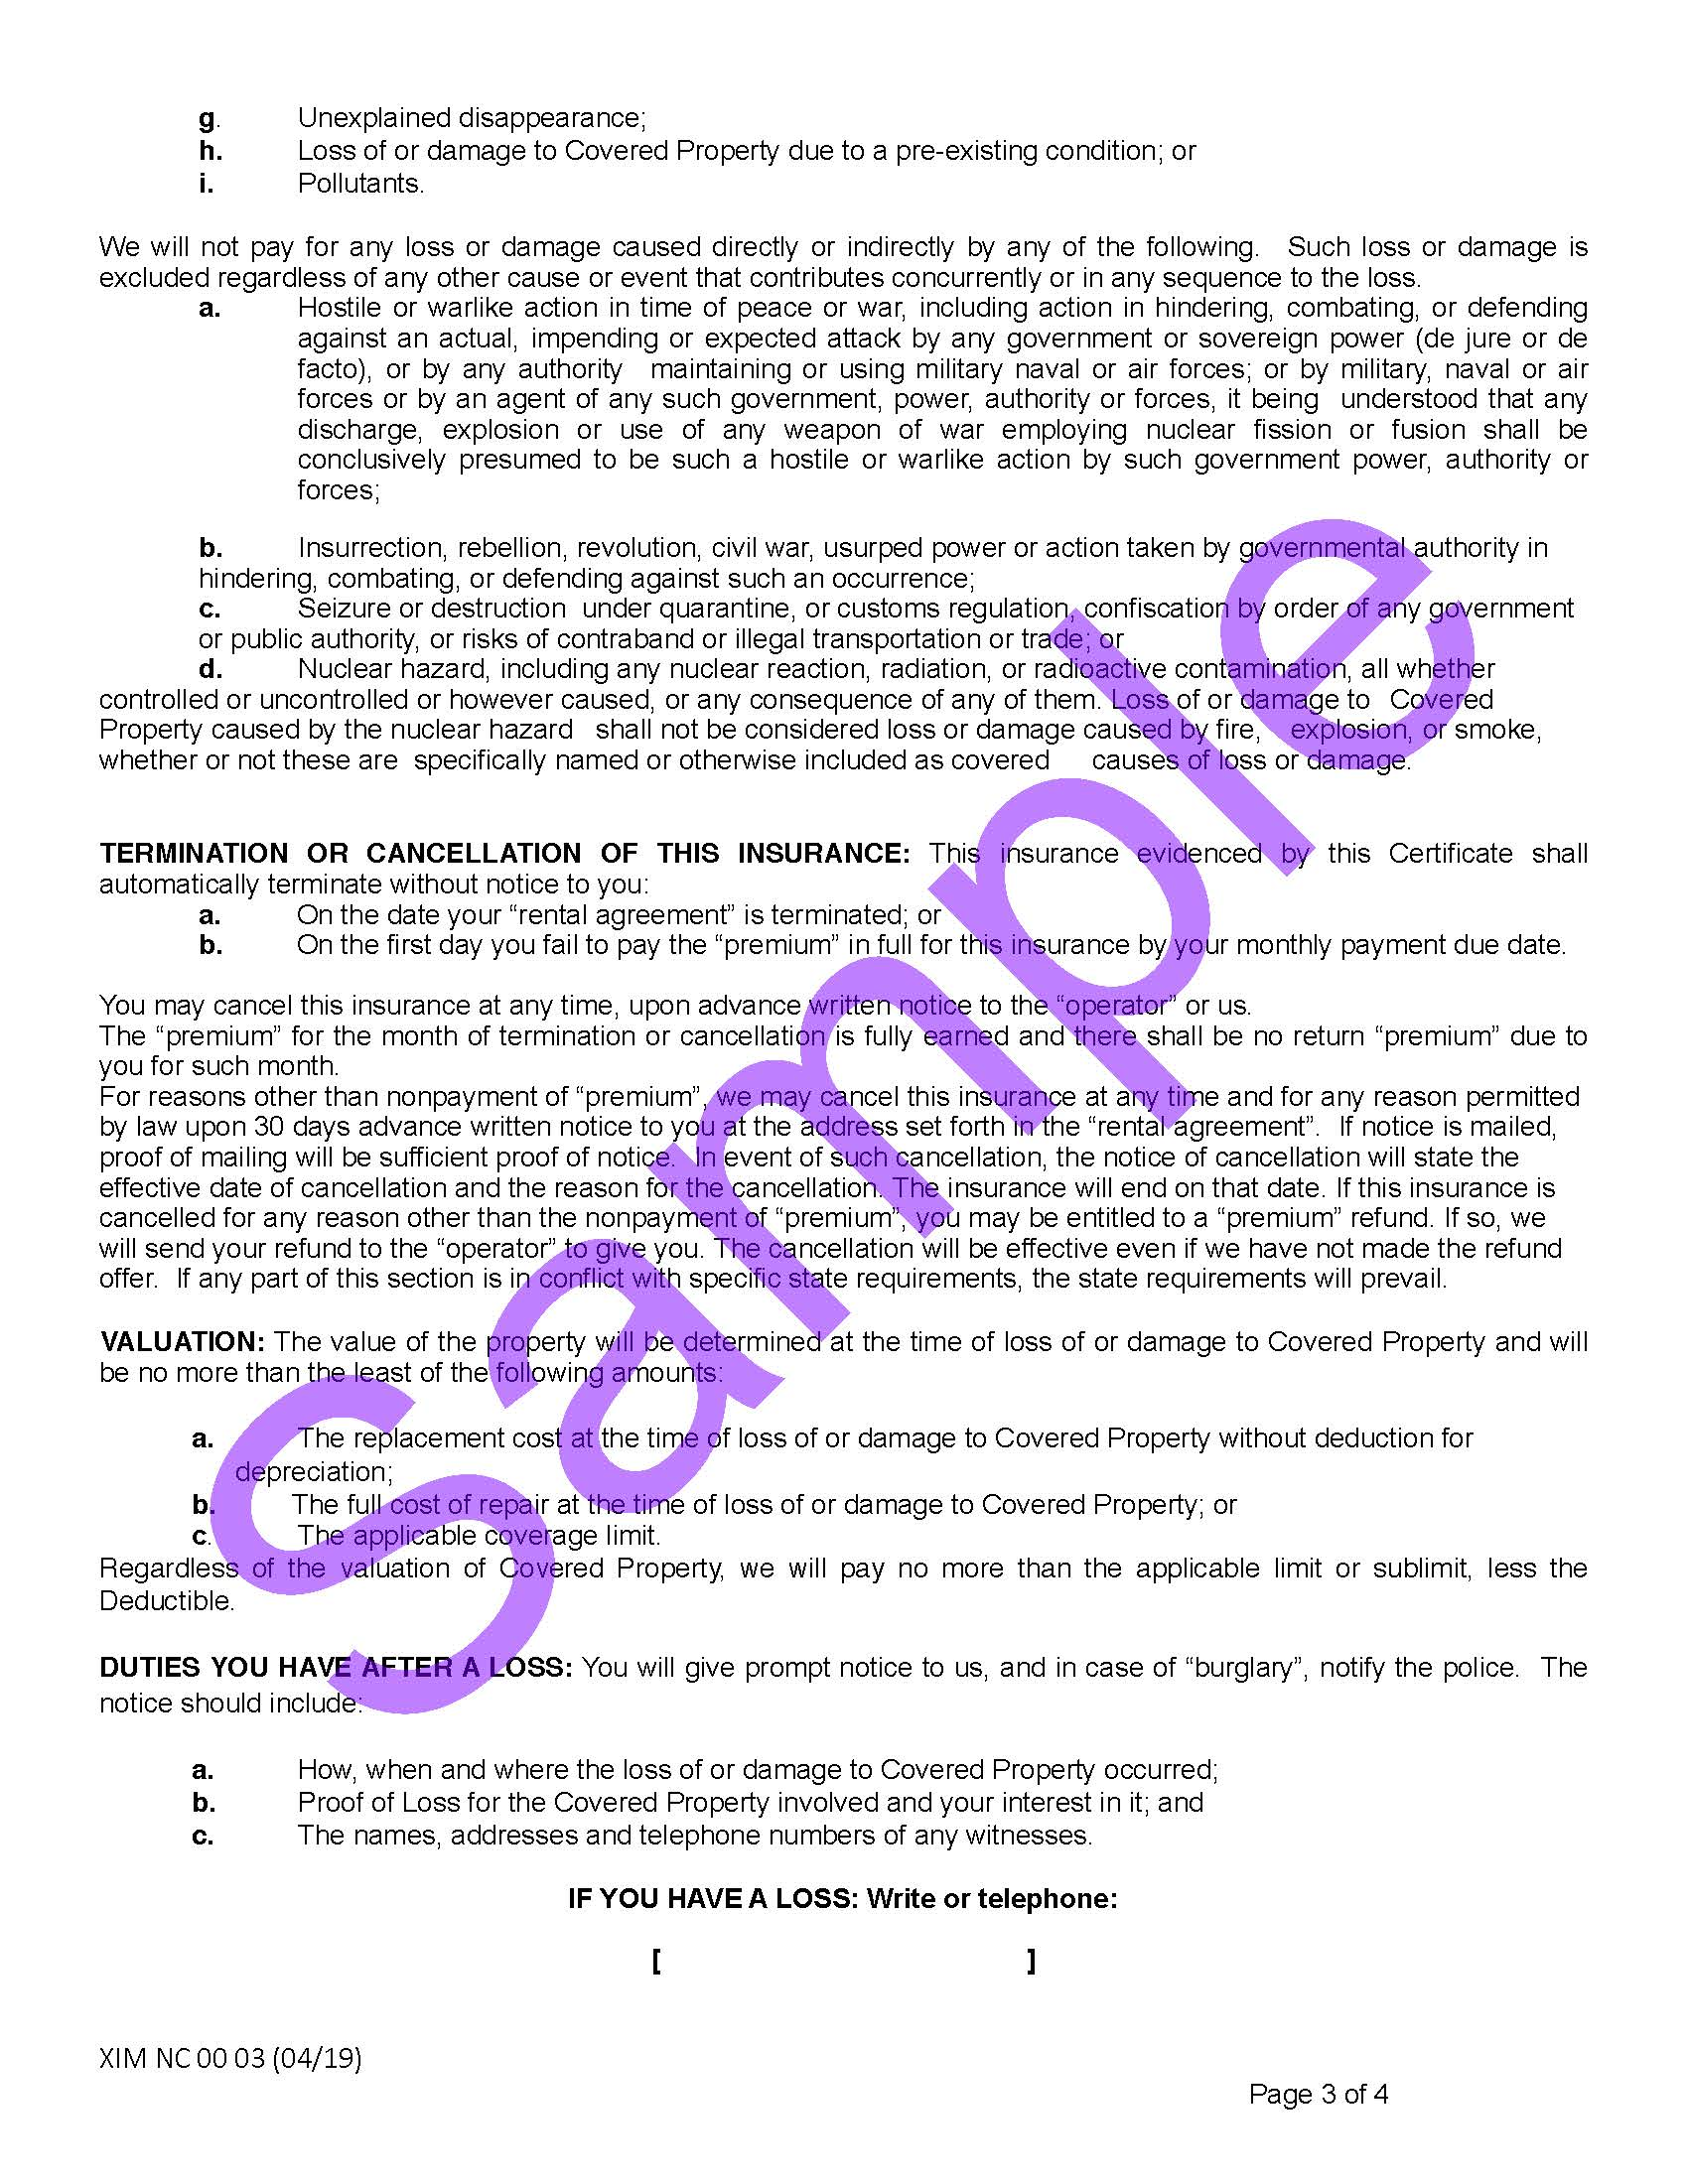 XIM NC 00 03 04 19 North Carolina Certificate of InsuranceSample_Page_3.jpg